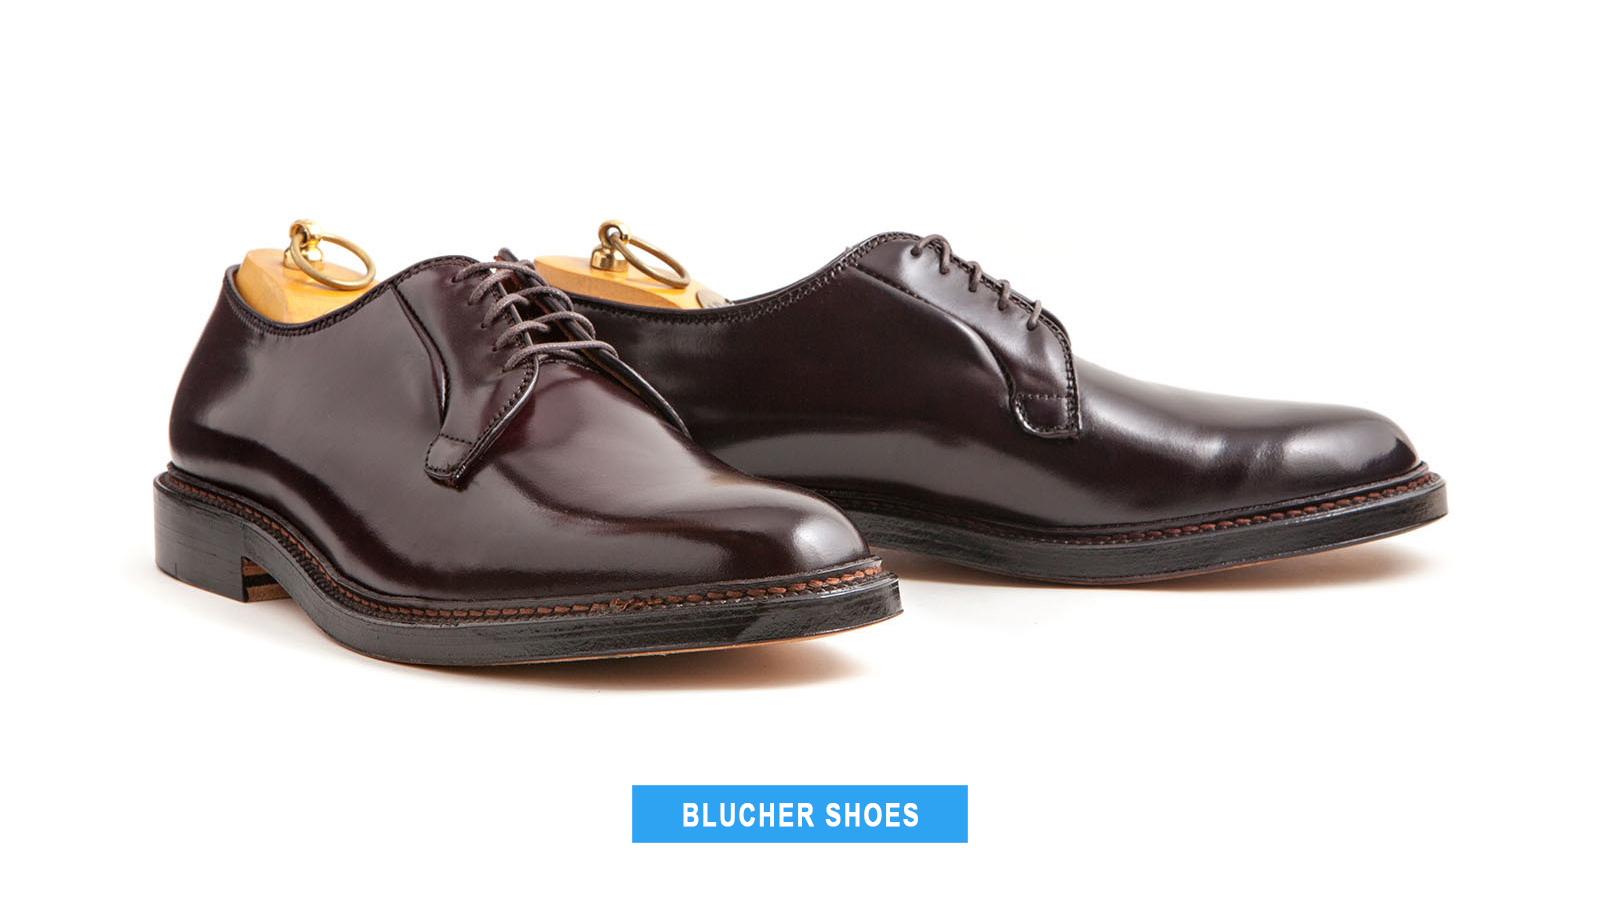 blucher dress shoes style